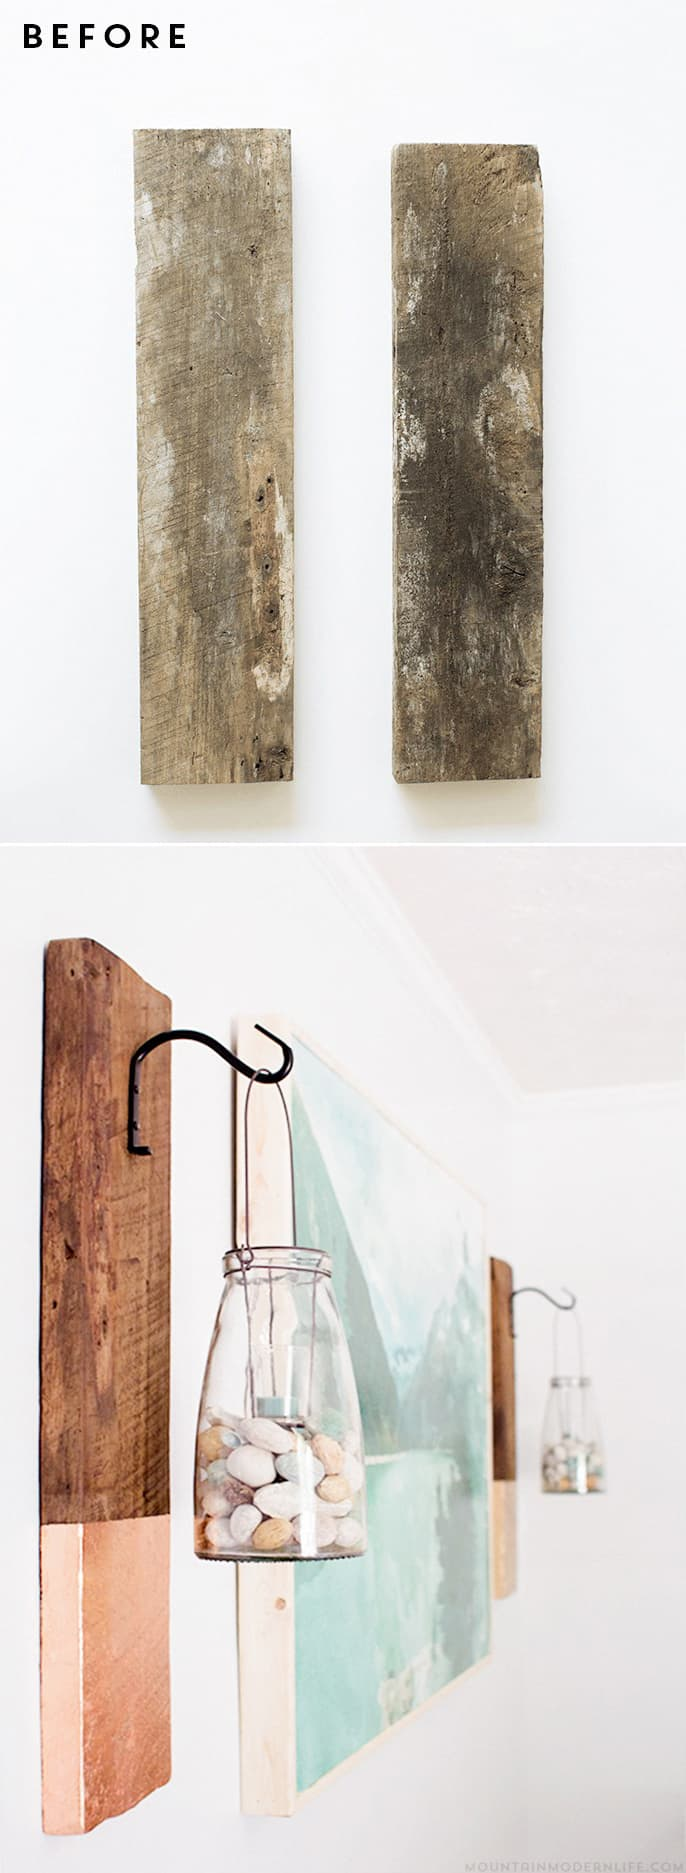 diy-rustic-modern-wall-sconce-reclaimed-wood-mountainmodernlife-com